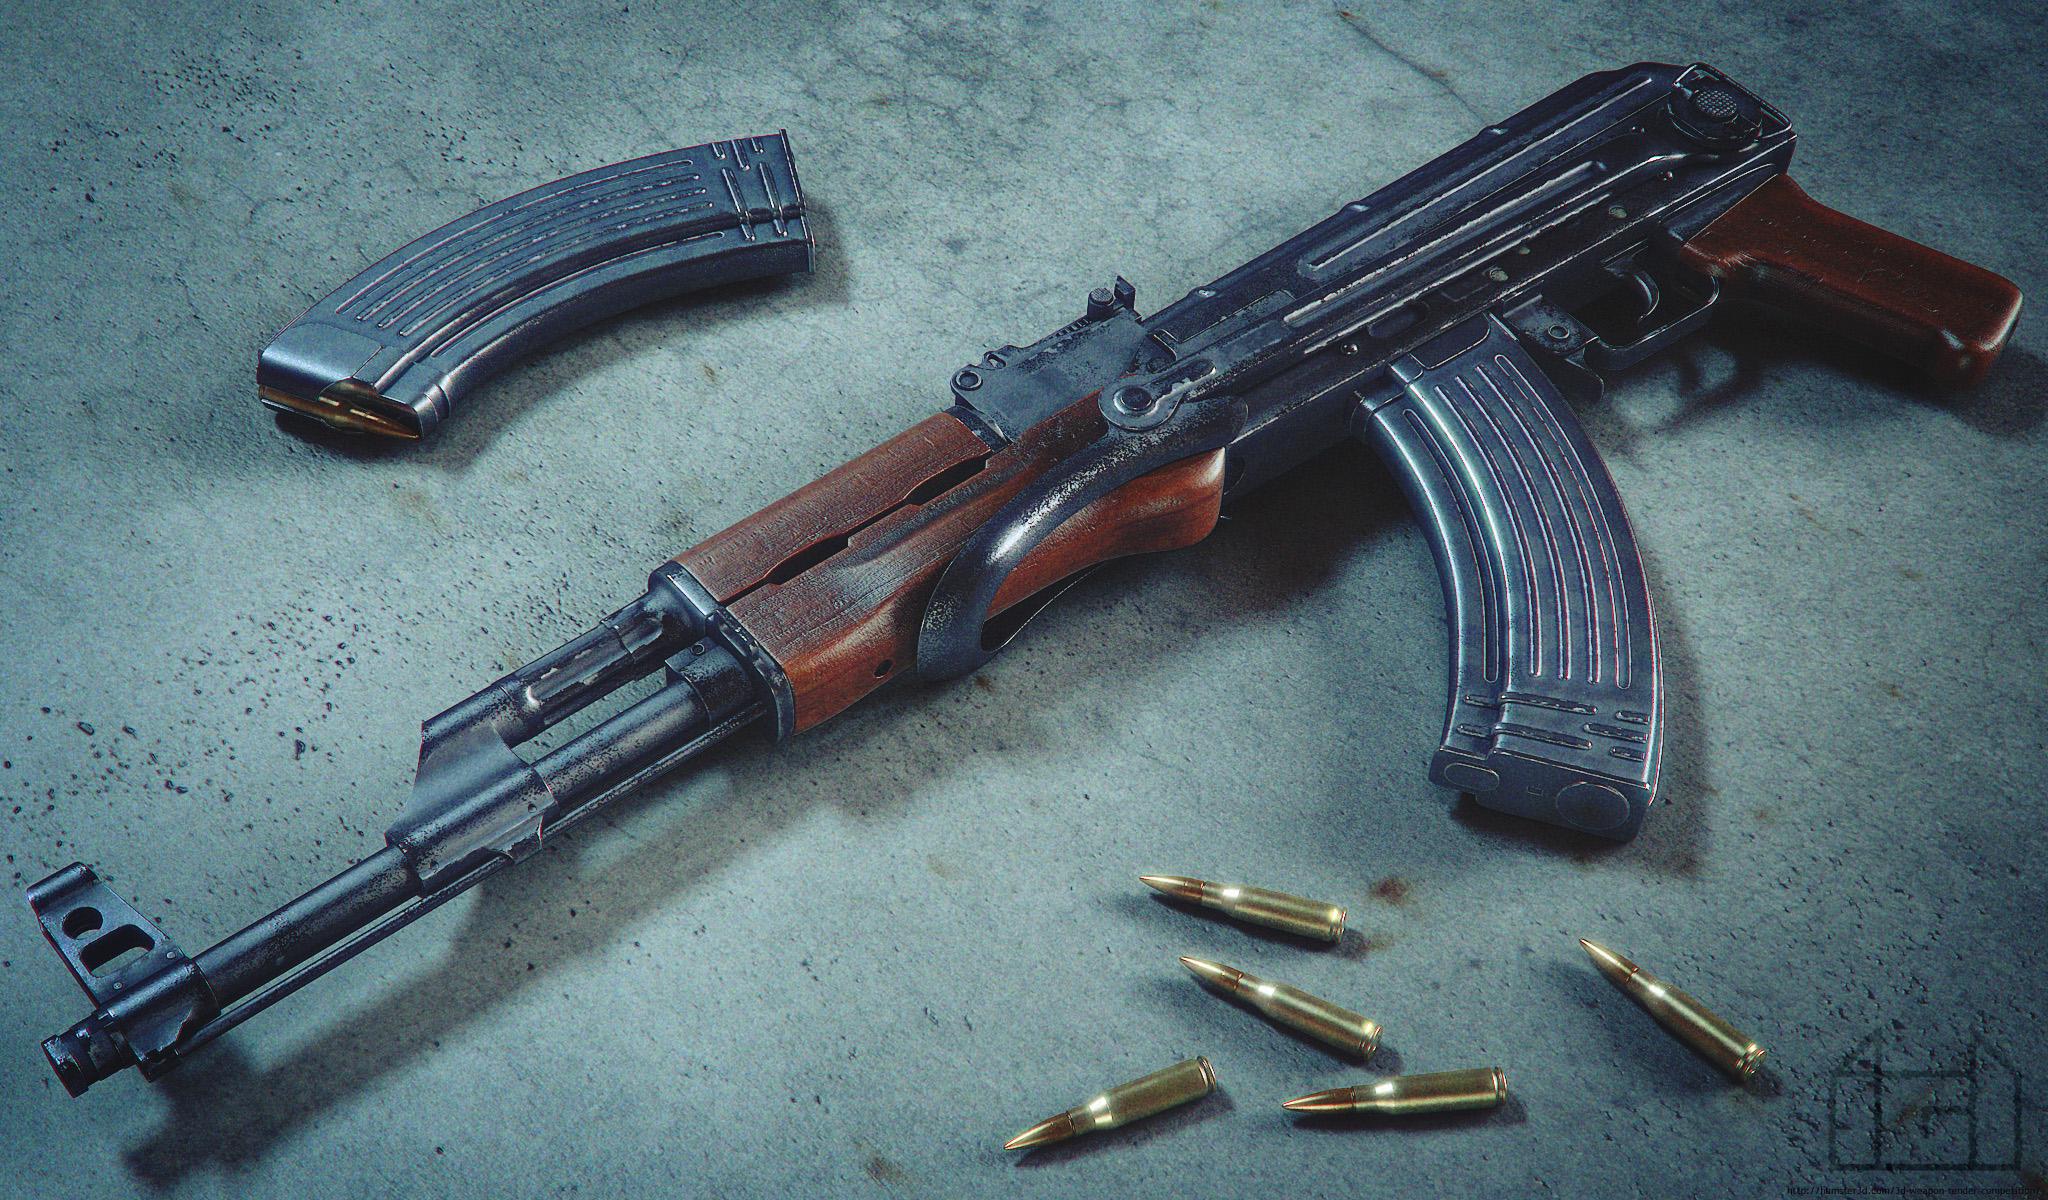 Kalashnikov AKMS 3d art